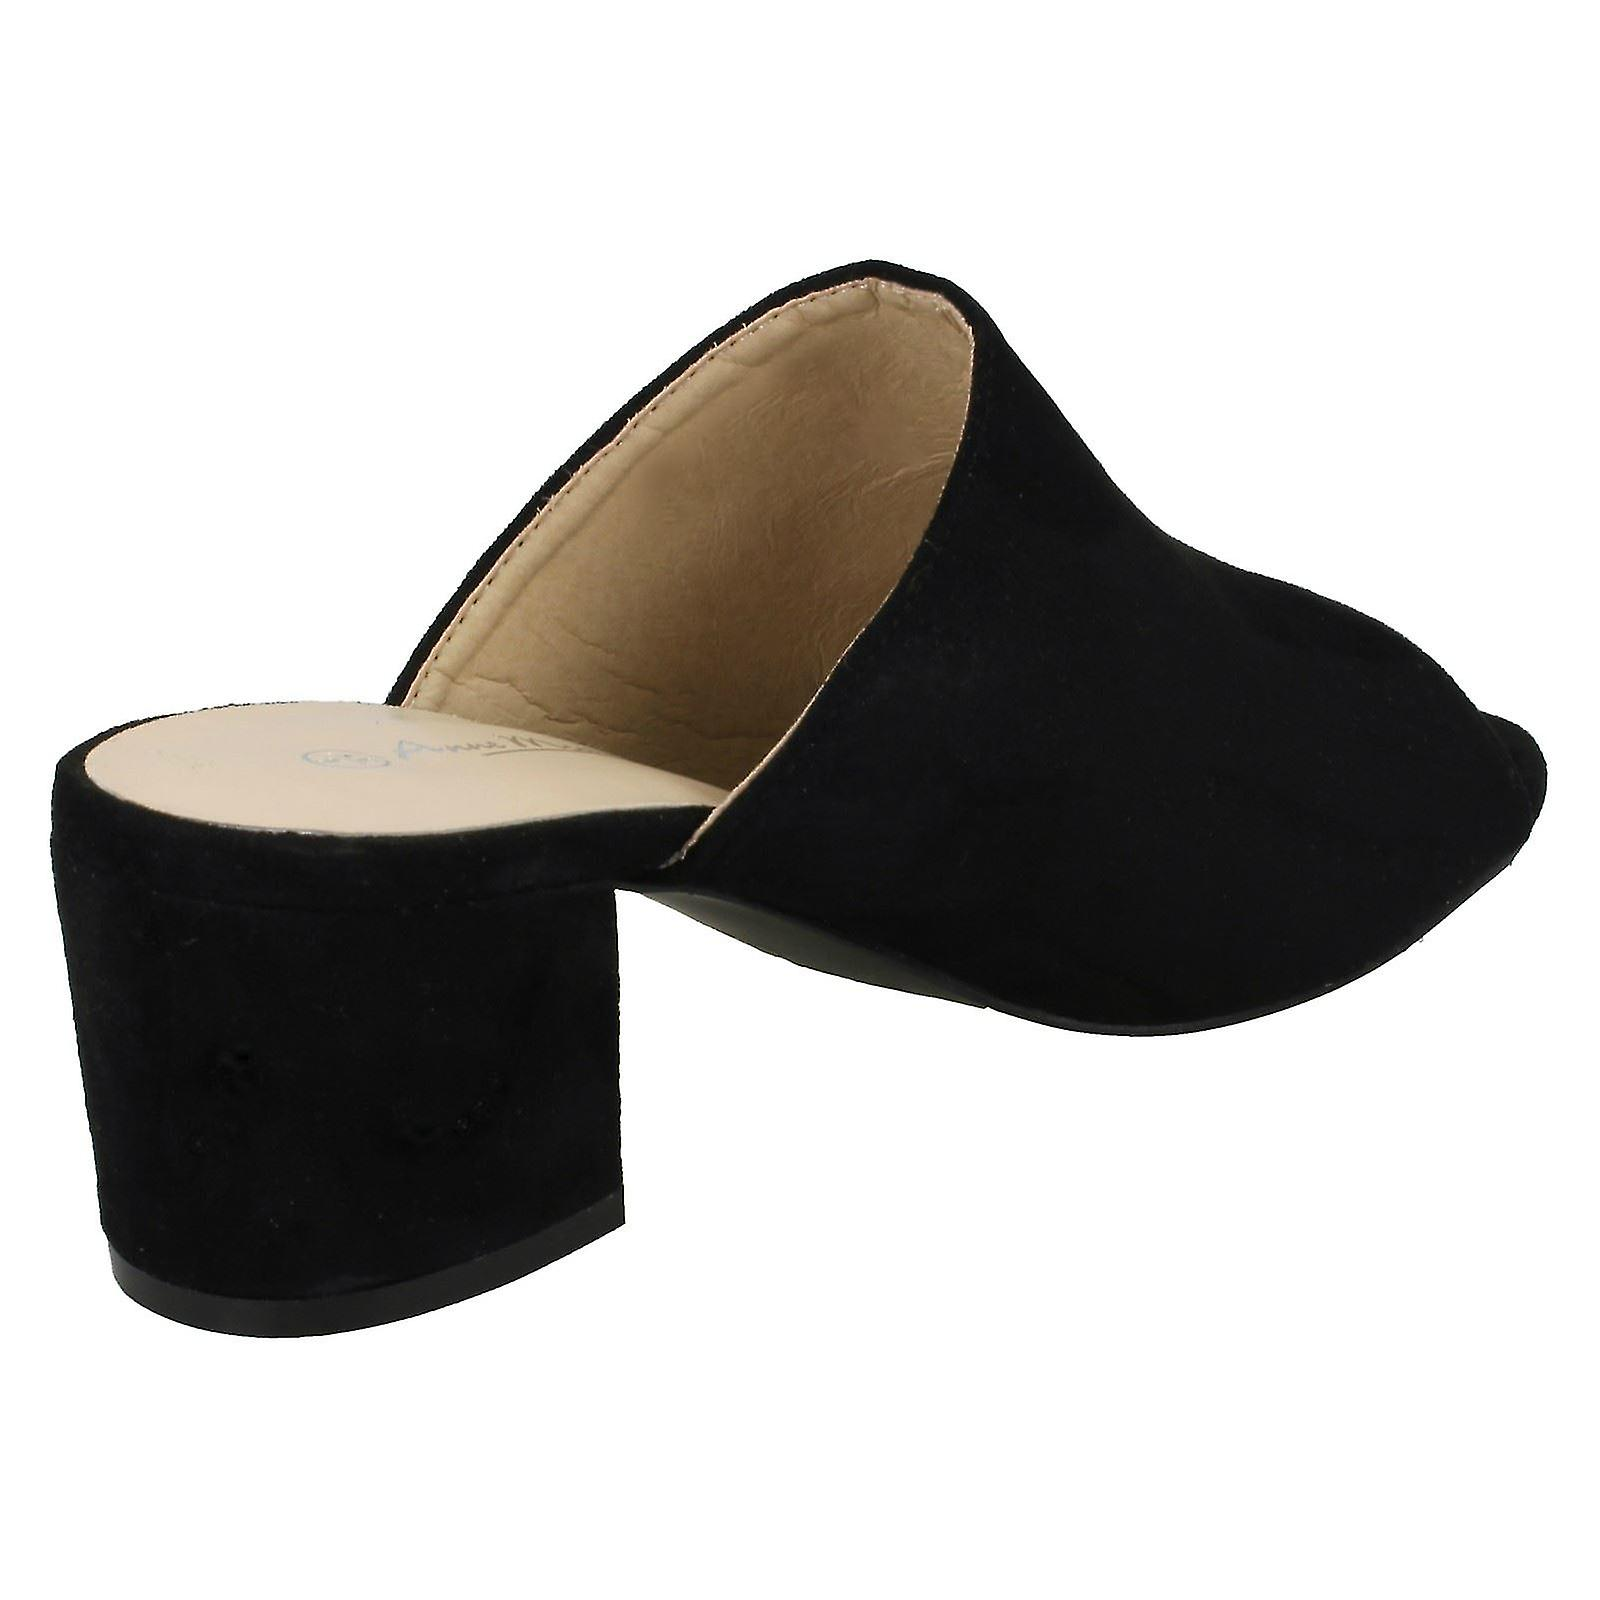 Anne Michelle Womens/dames Pieds Carrés Microfibre Chunky High Heels